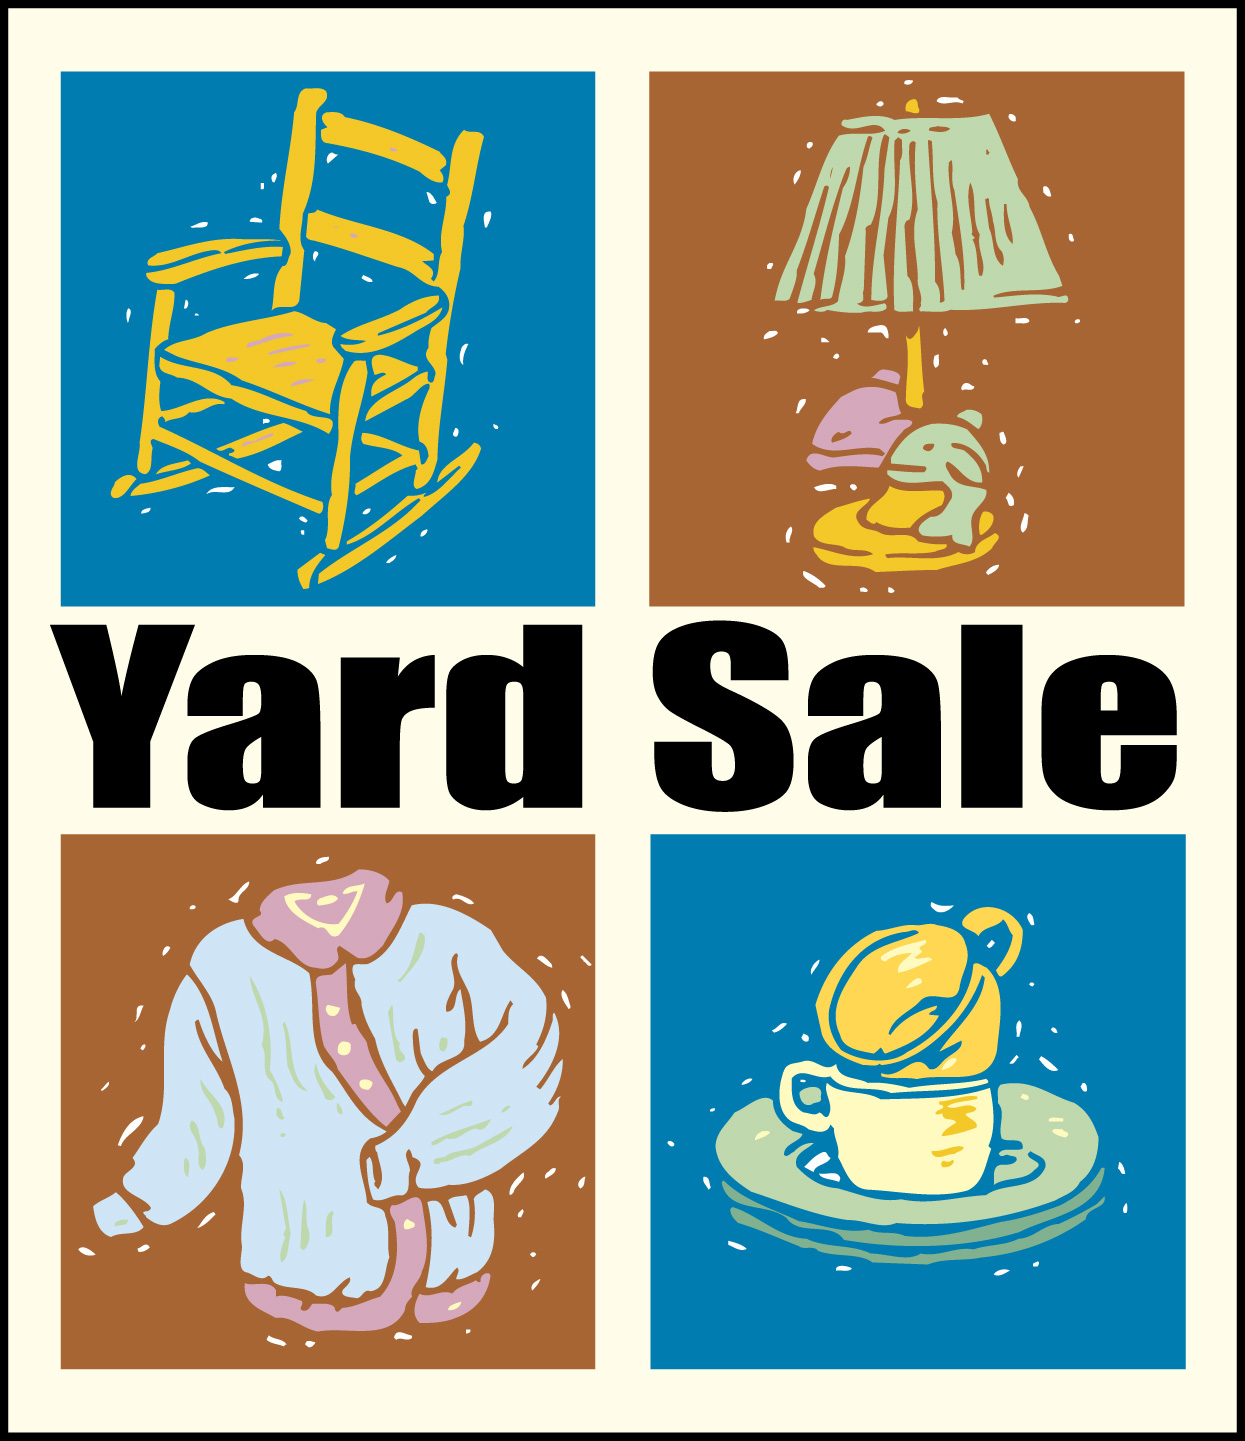 Church Rummage Sales This Weekend: St. Ansgar Lutheran Church: Yard Sale This Saturday 6/11